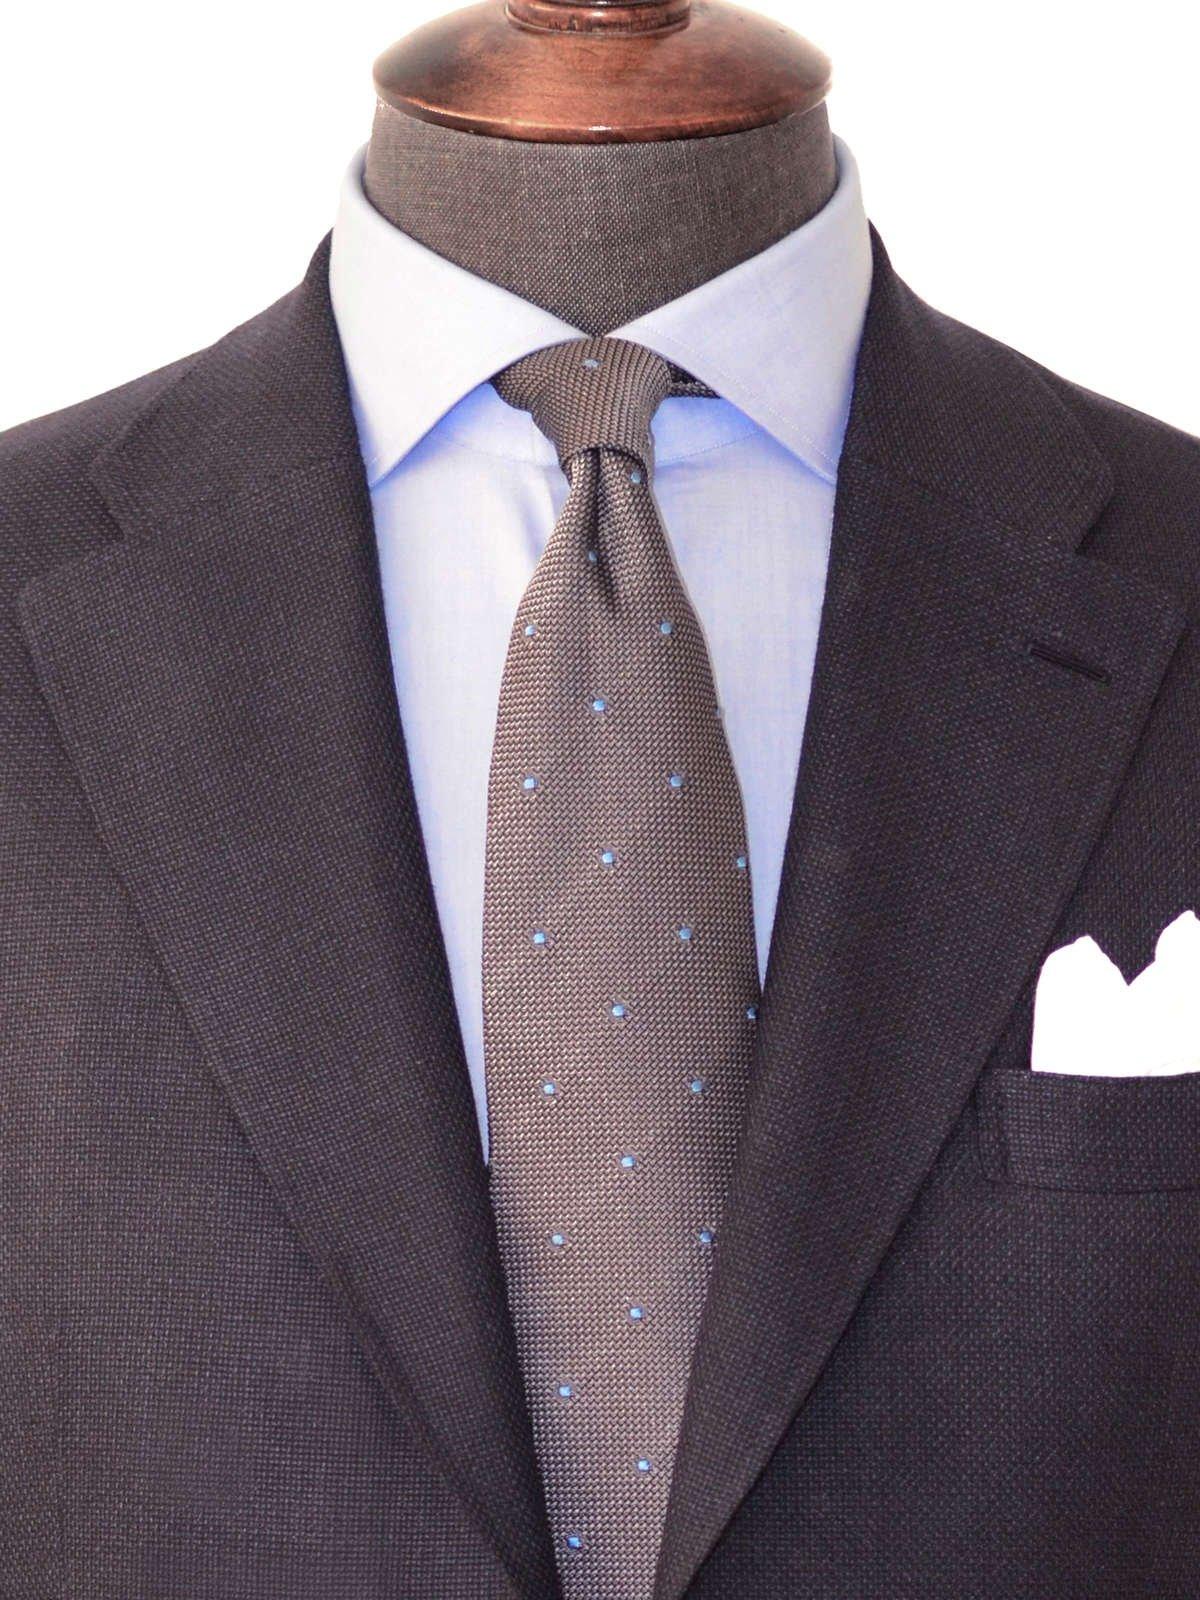 Bespoke shirt, Italian cotton shirt, luxury shirt, luxury bespoke, light blue shirt, bespoke tie, bespoke suit, navy suit, cut away collar, silk grenadine tie